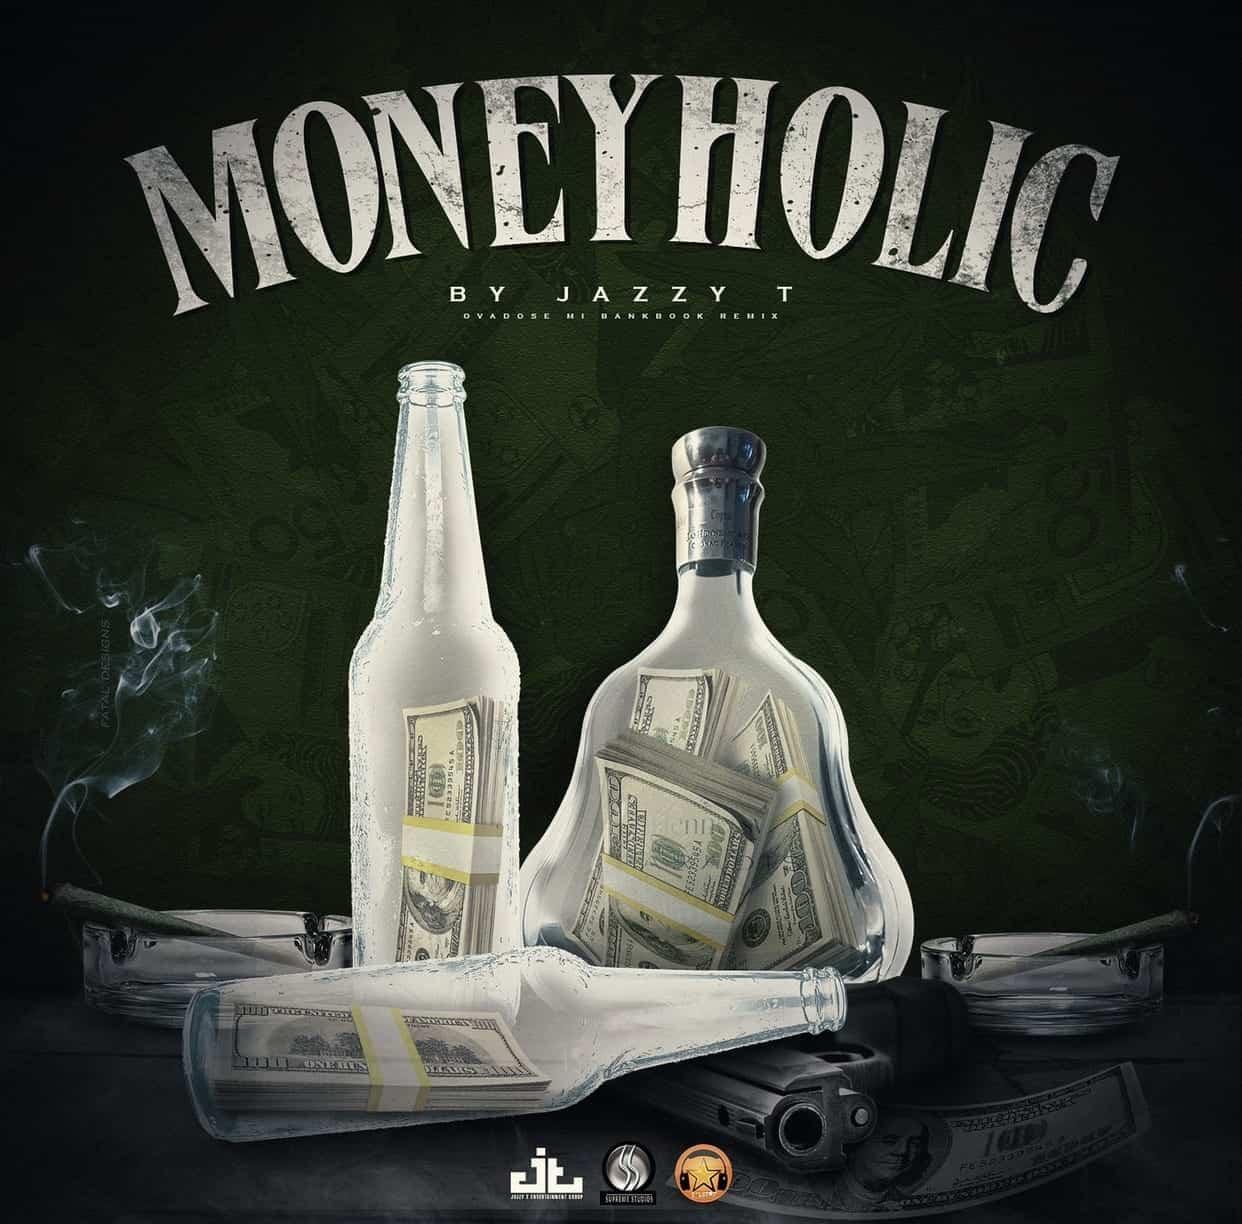 Moneyholic Feat. Rane Son & Vybz Kartel - By Jazzy T - DJ pack